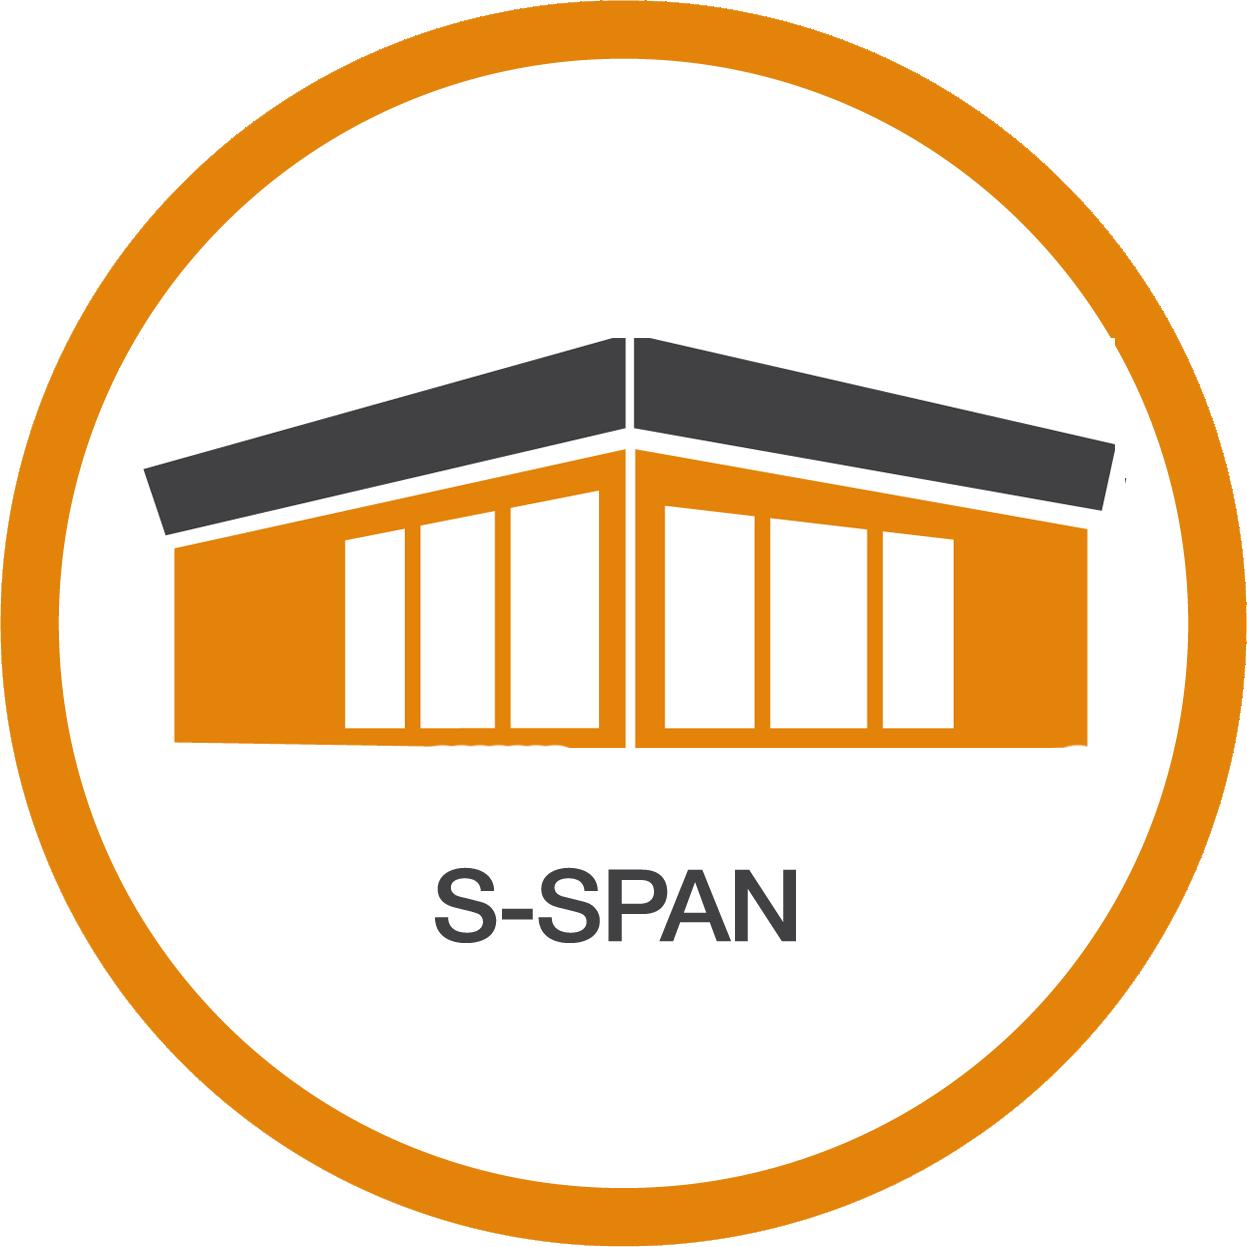 S-SPAN